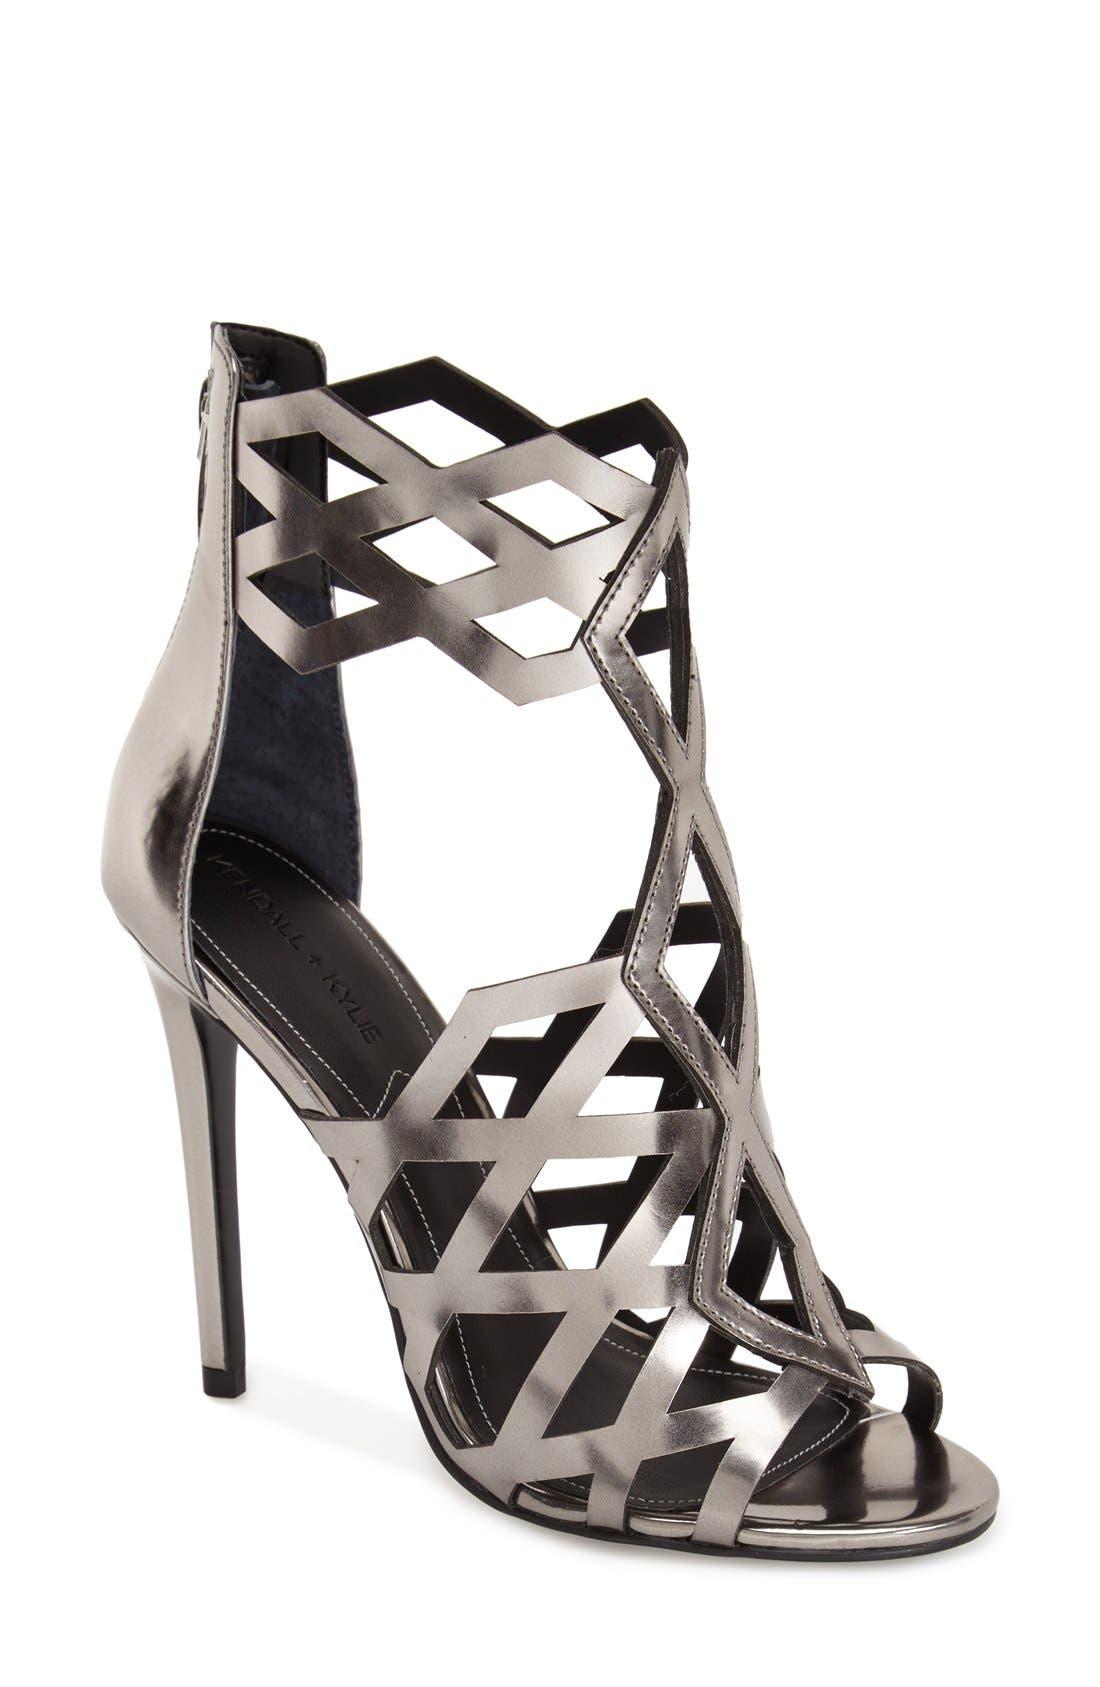 Main Image - KENDALL + KYLIE 'Elena' Cutout Sandal (Women)